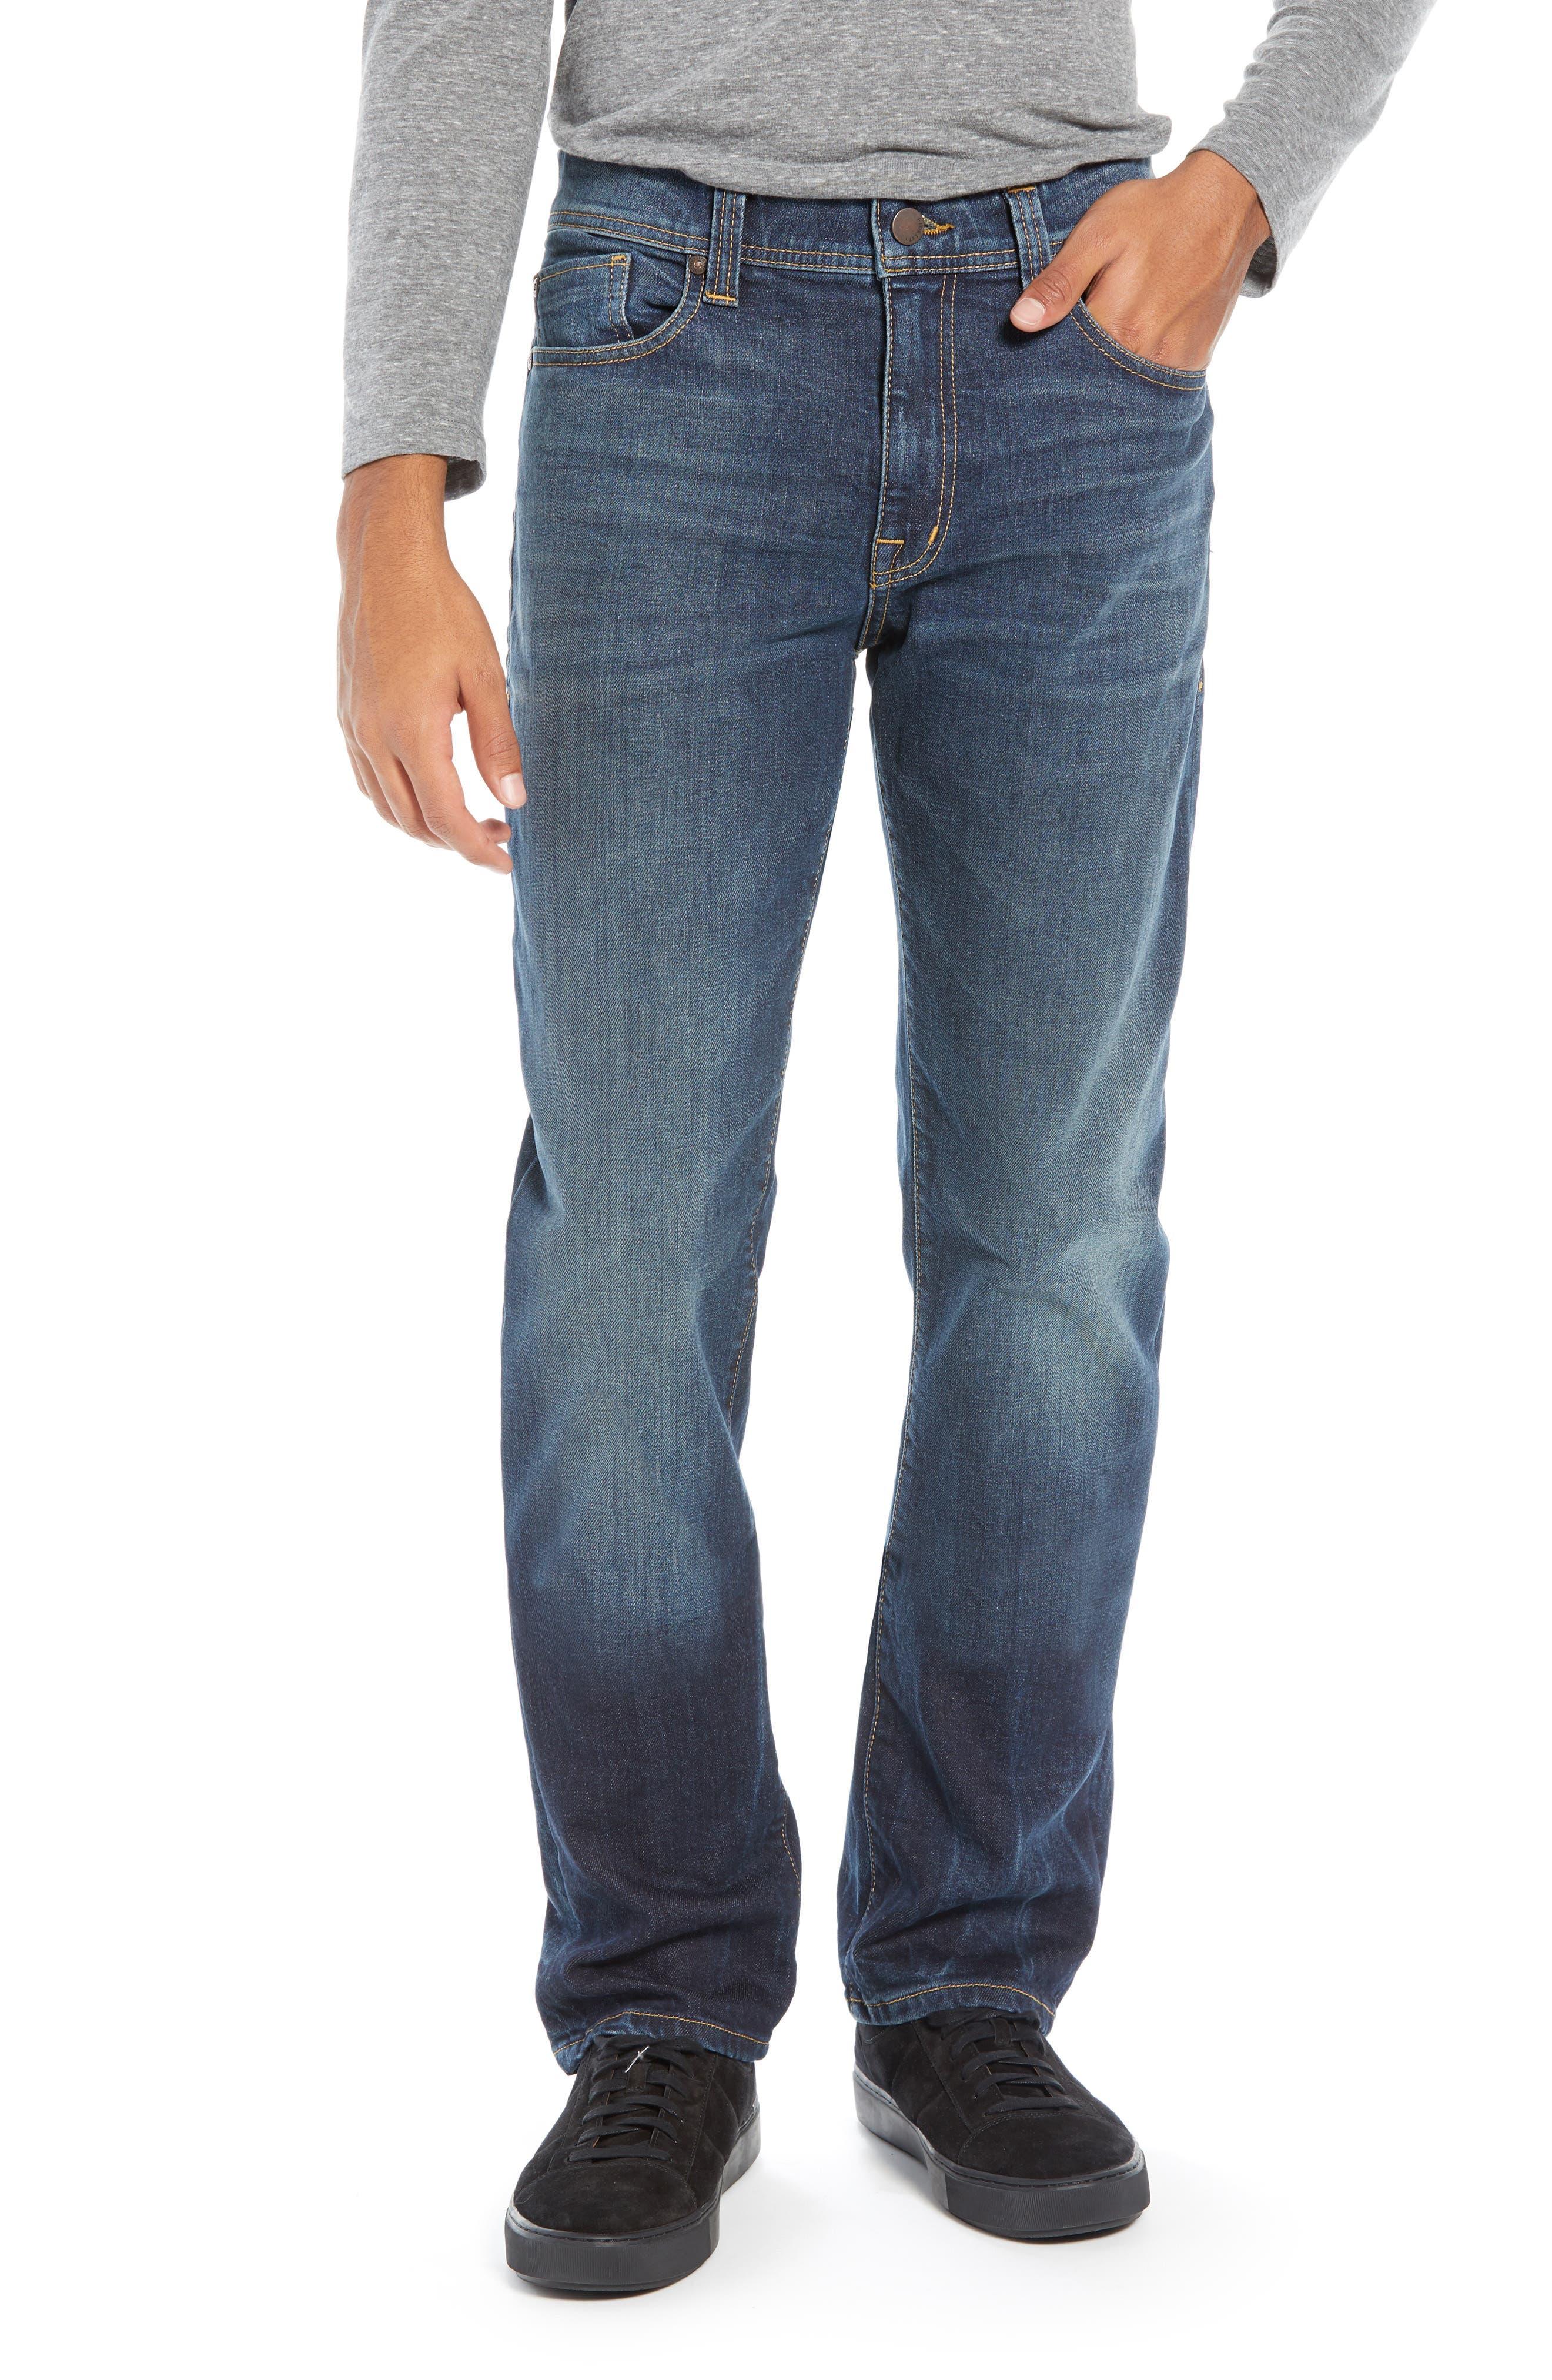 Jimmy Slim Straight Leg Jeans,                             Main thumbnail 1, color,                             NIAGARA